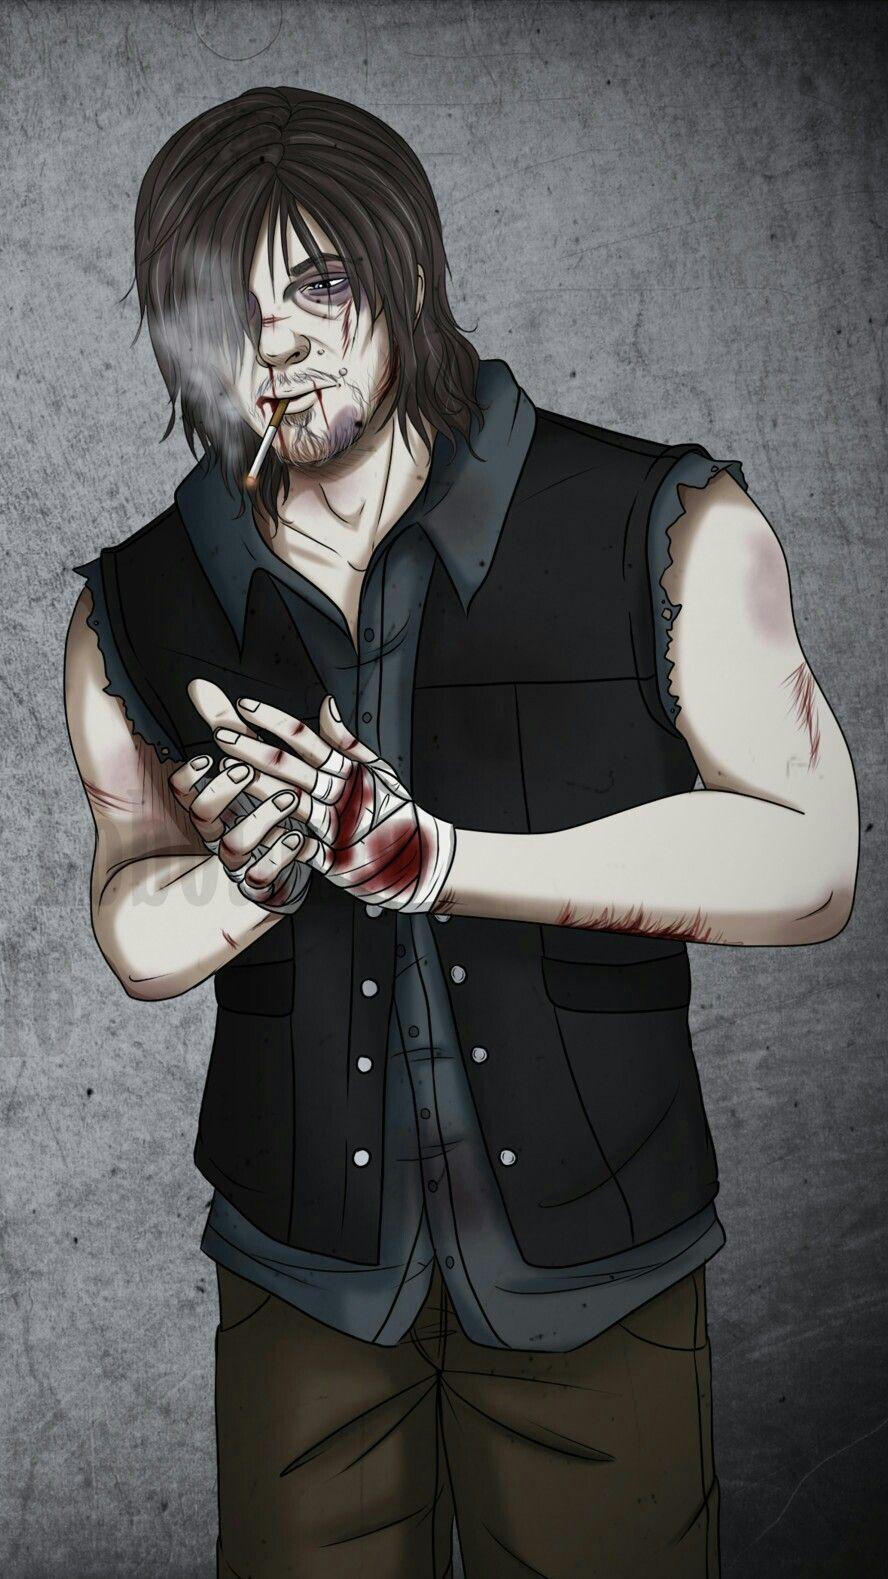 DARYL DIXON Daryl dixon walking dead, Daryl dixon